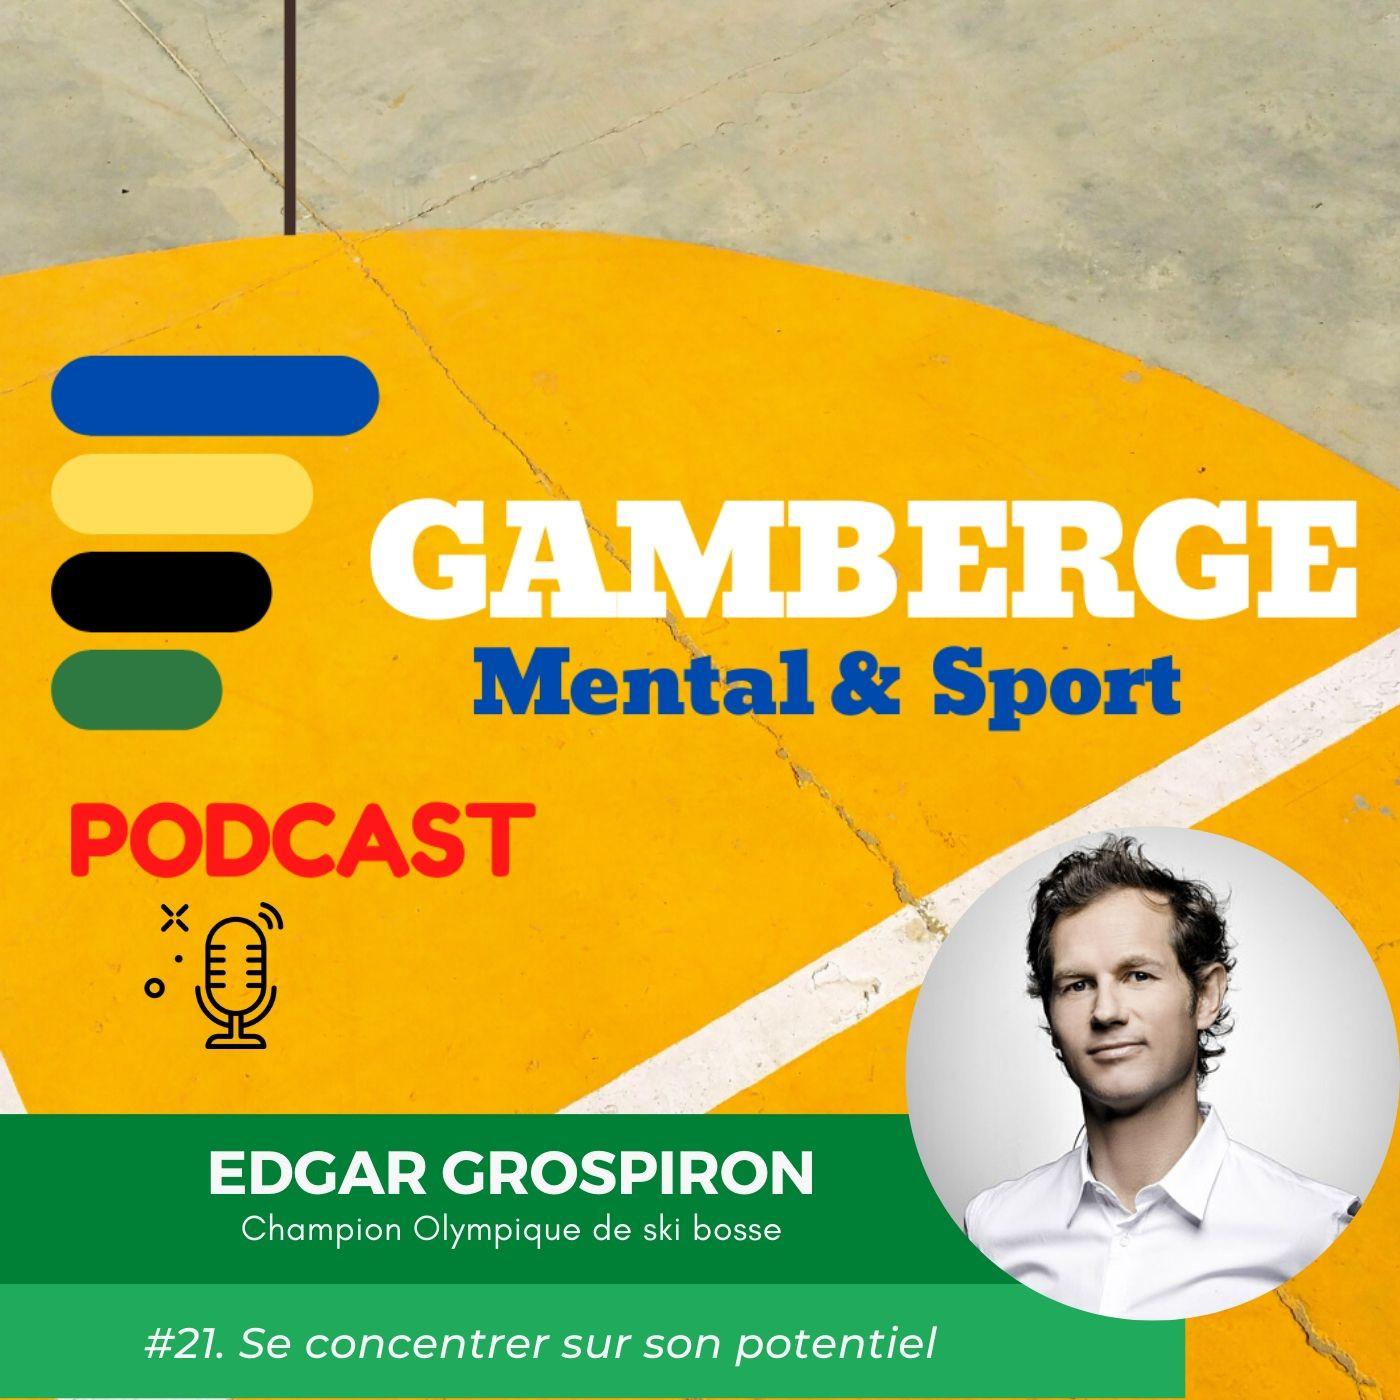 #21. Edgar Grospiron: Se concentrer sur son potentiel